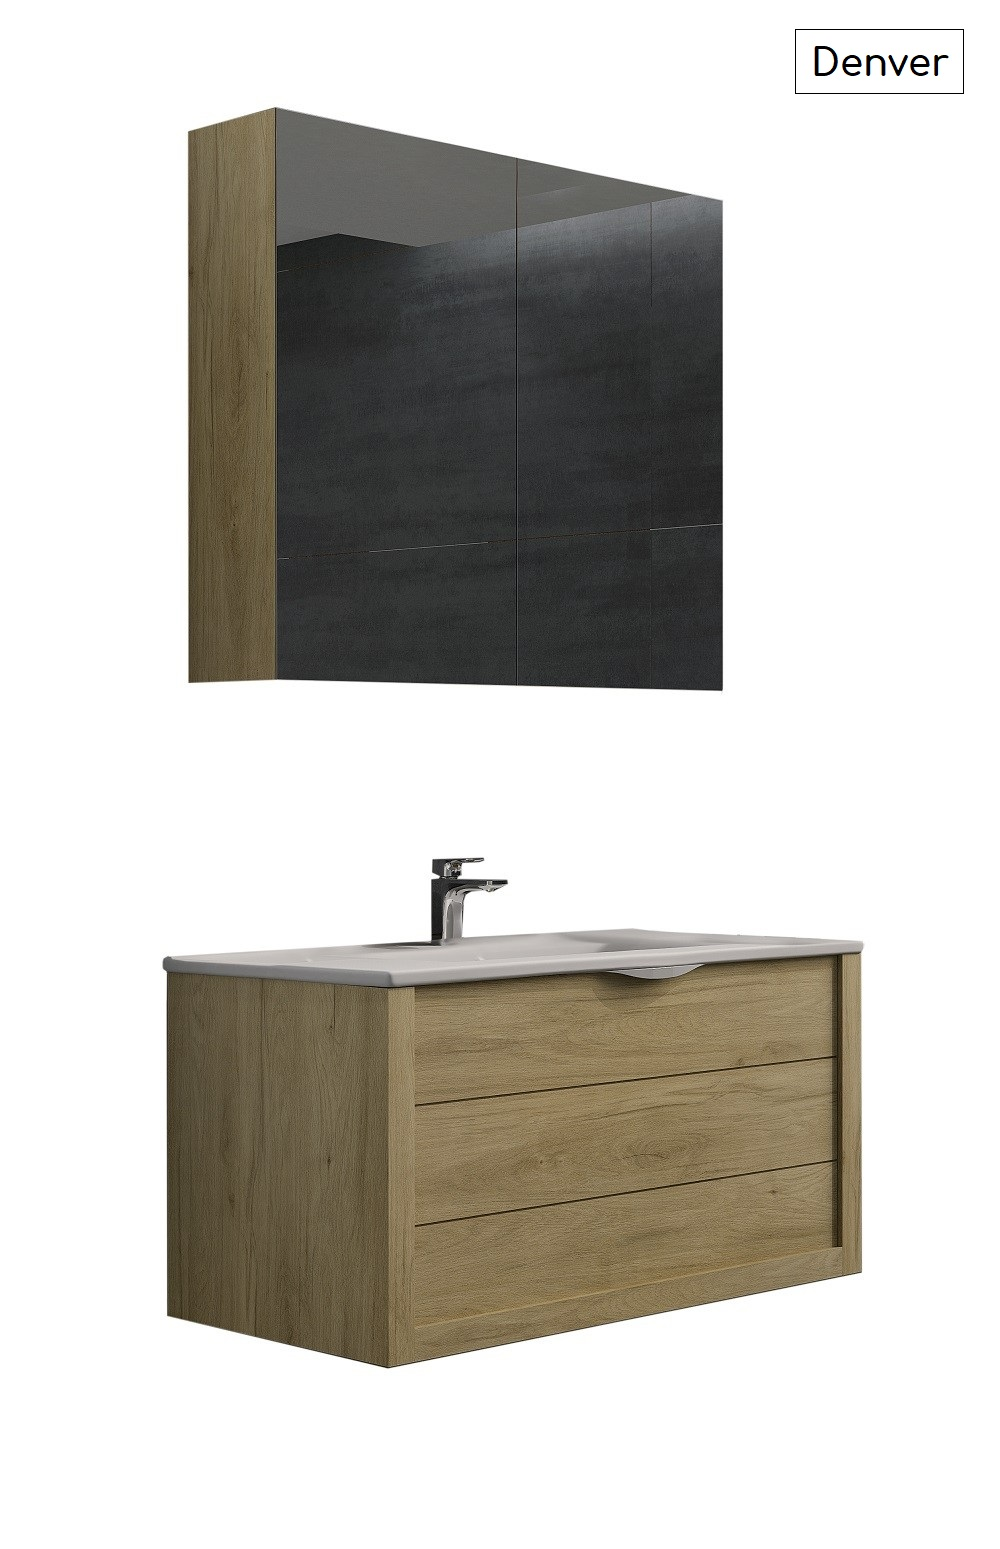 Batinea - Meuble de salle de bain Emma, Blanc, 60, Avec meuble miroir + applique, Avec colonne. Batinea - Meuble de salle de bain Emma, Blanc, 60, Avec meuble miroir + applique, Avec colonne